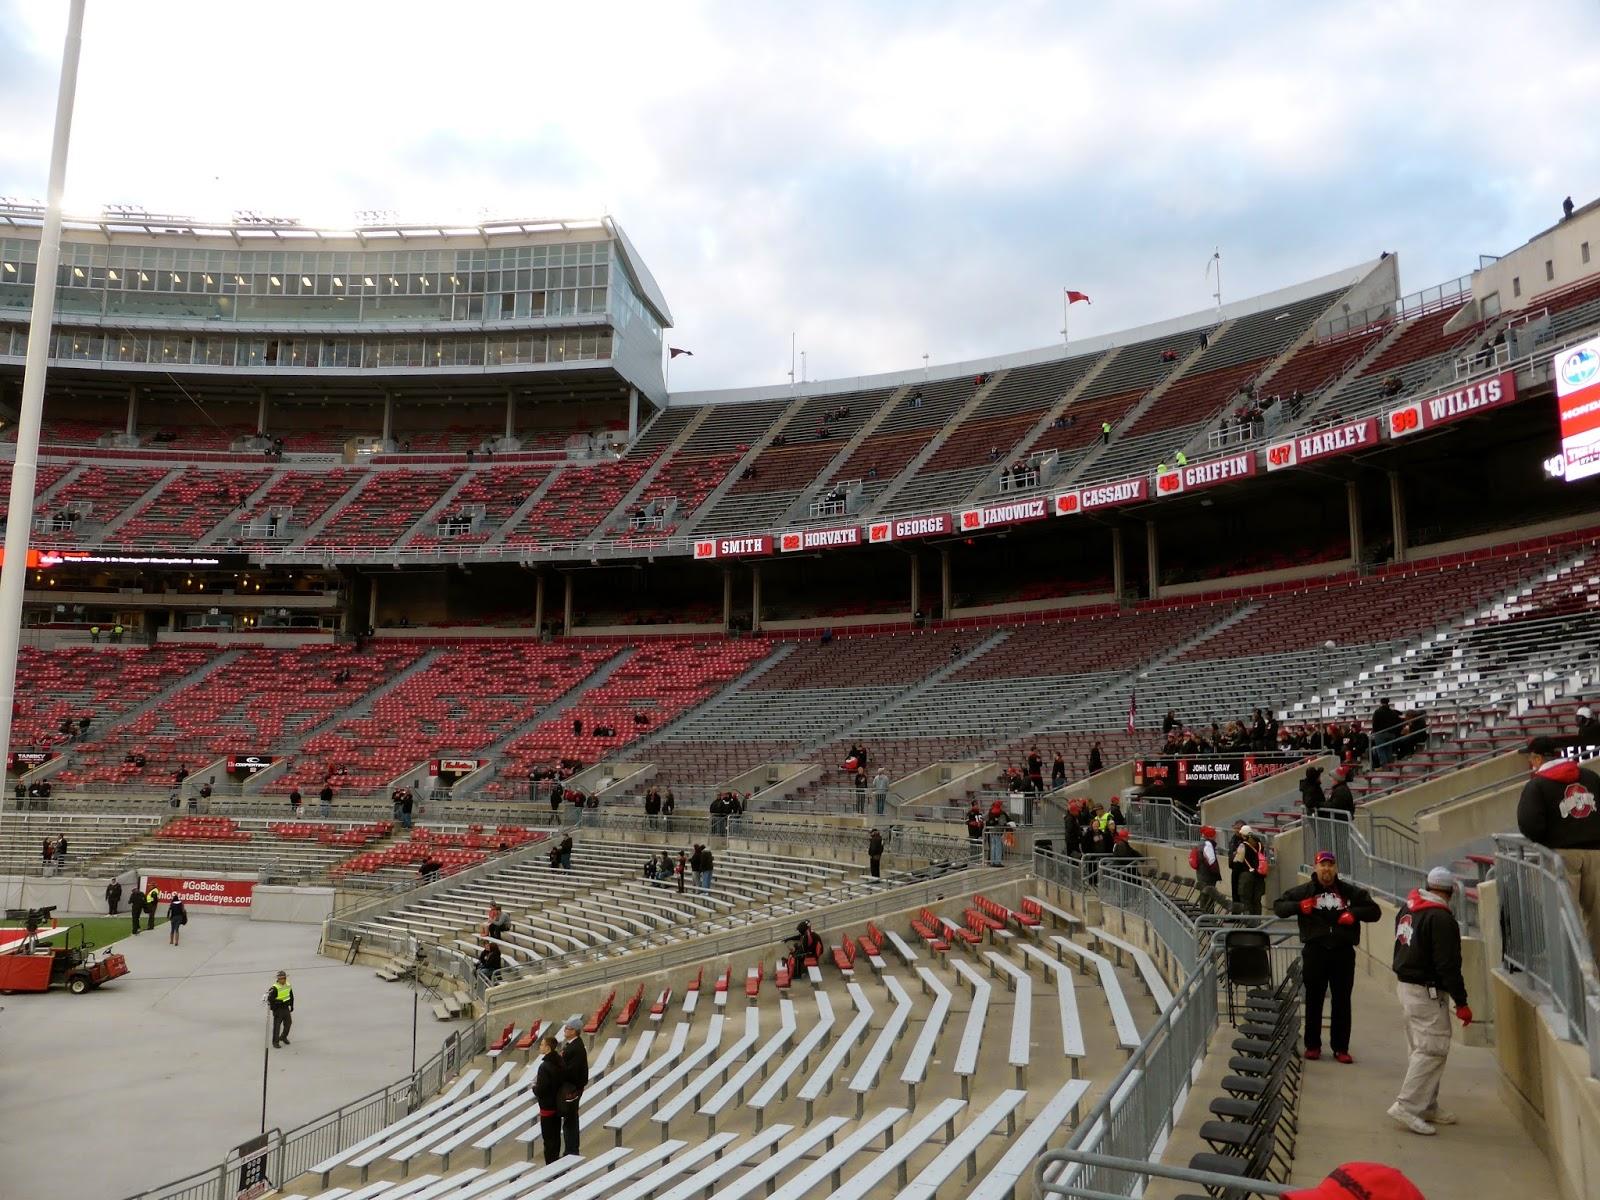 Sports Road Trips Penn State Nittany Lions 10 At Ohio Buckeyes 38 NCAA Football Big Ten